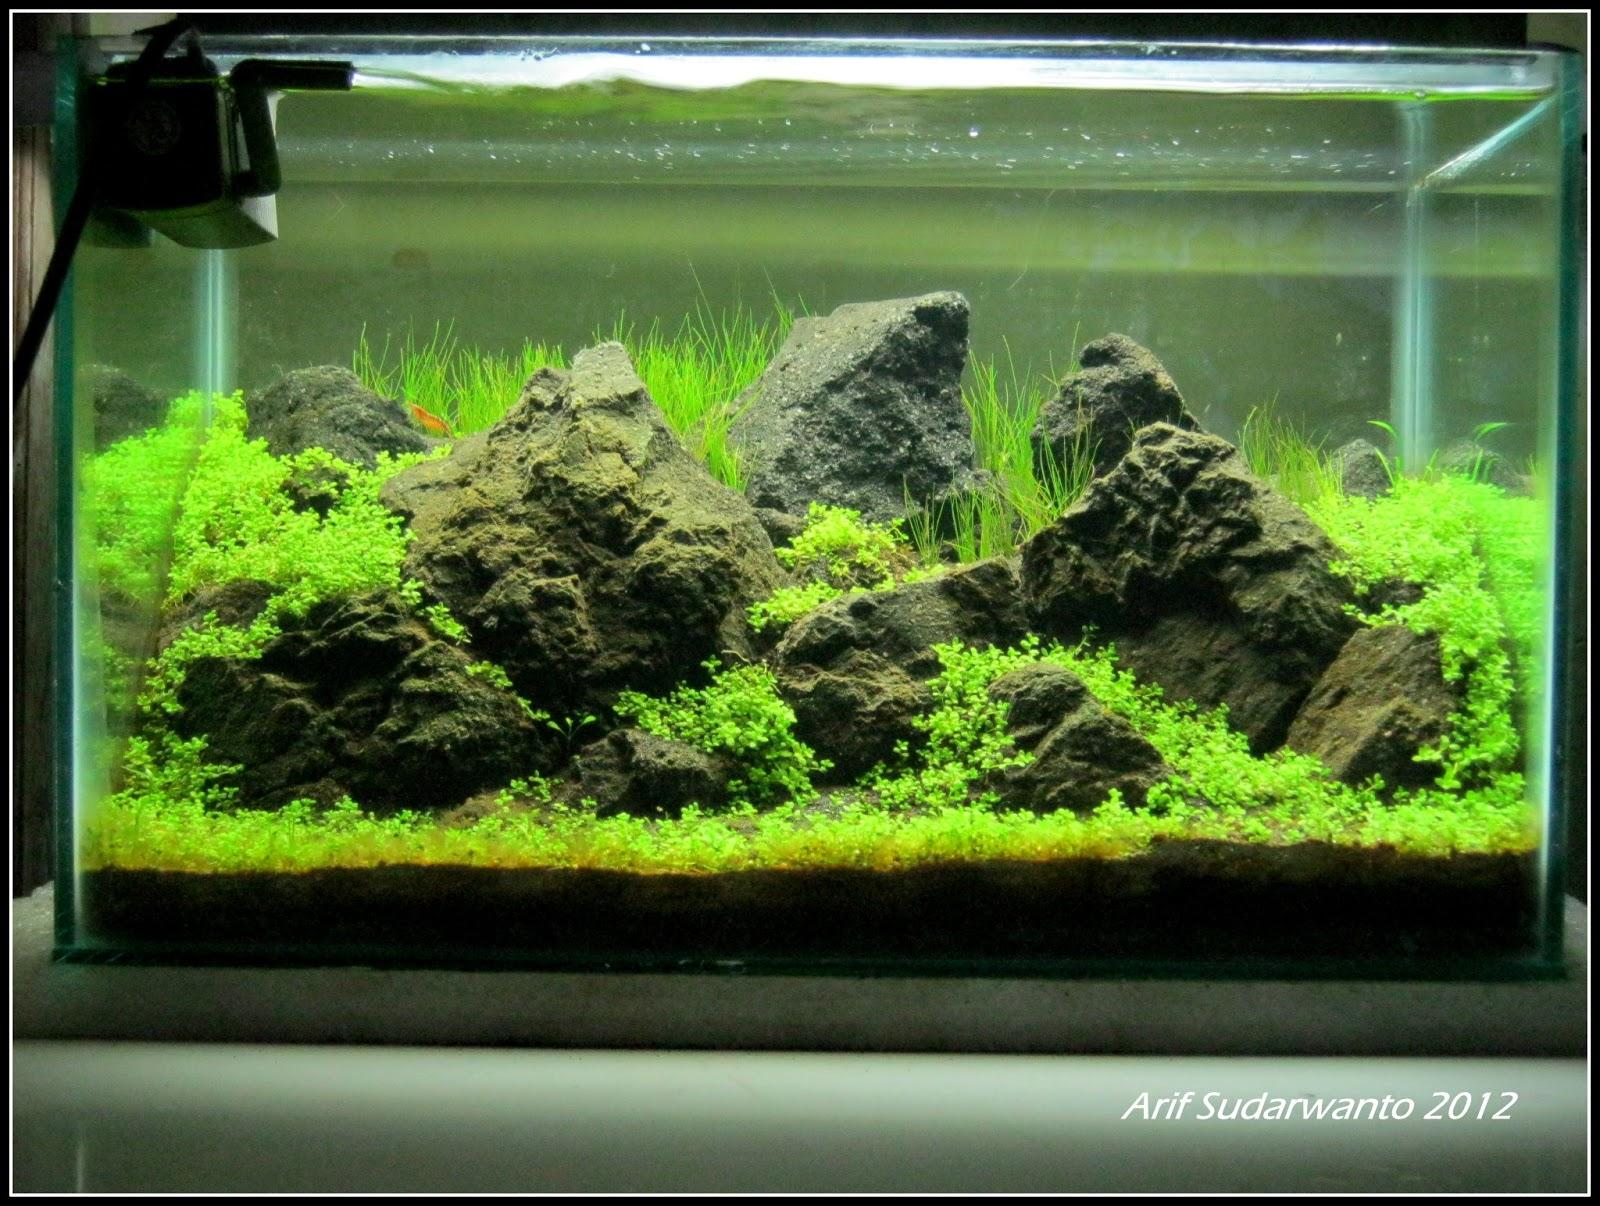 IWAQU Toko Ikan Hias - Aquascape, Ikan Hias, Aquarium dan ...